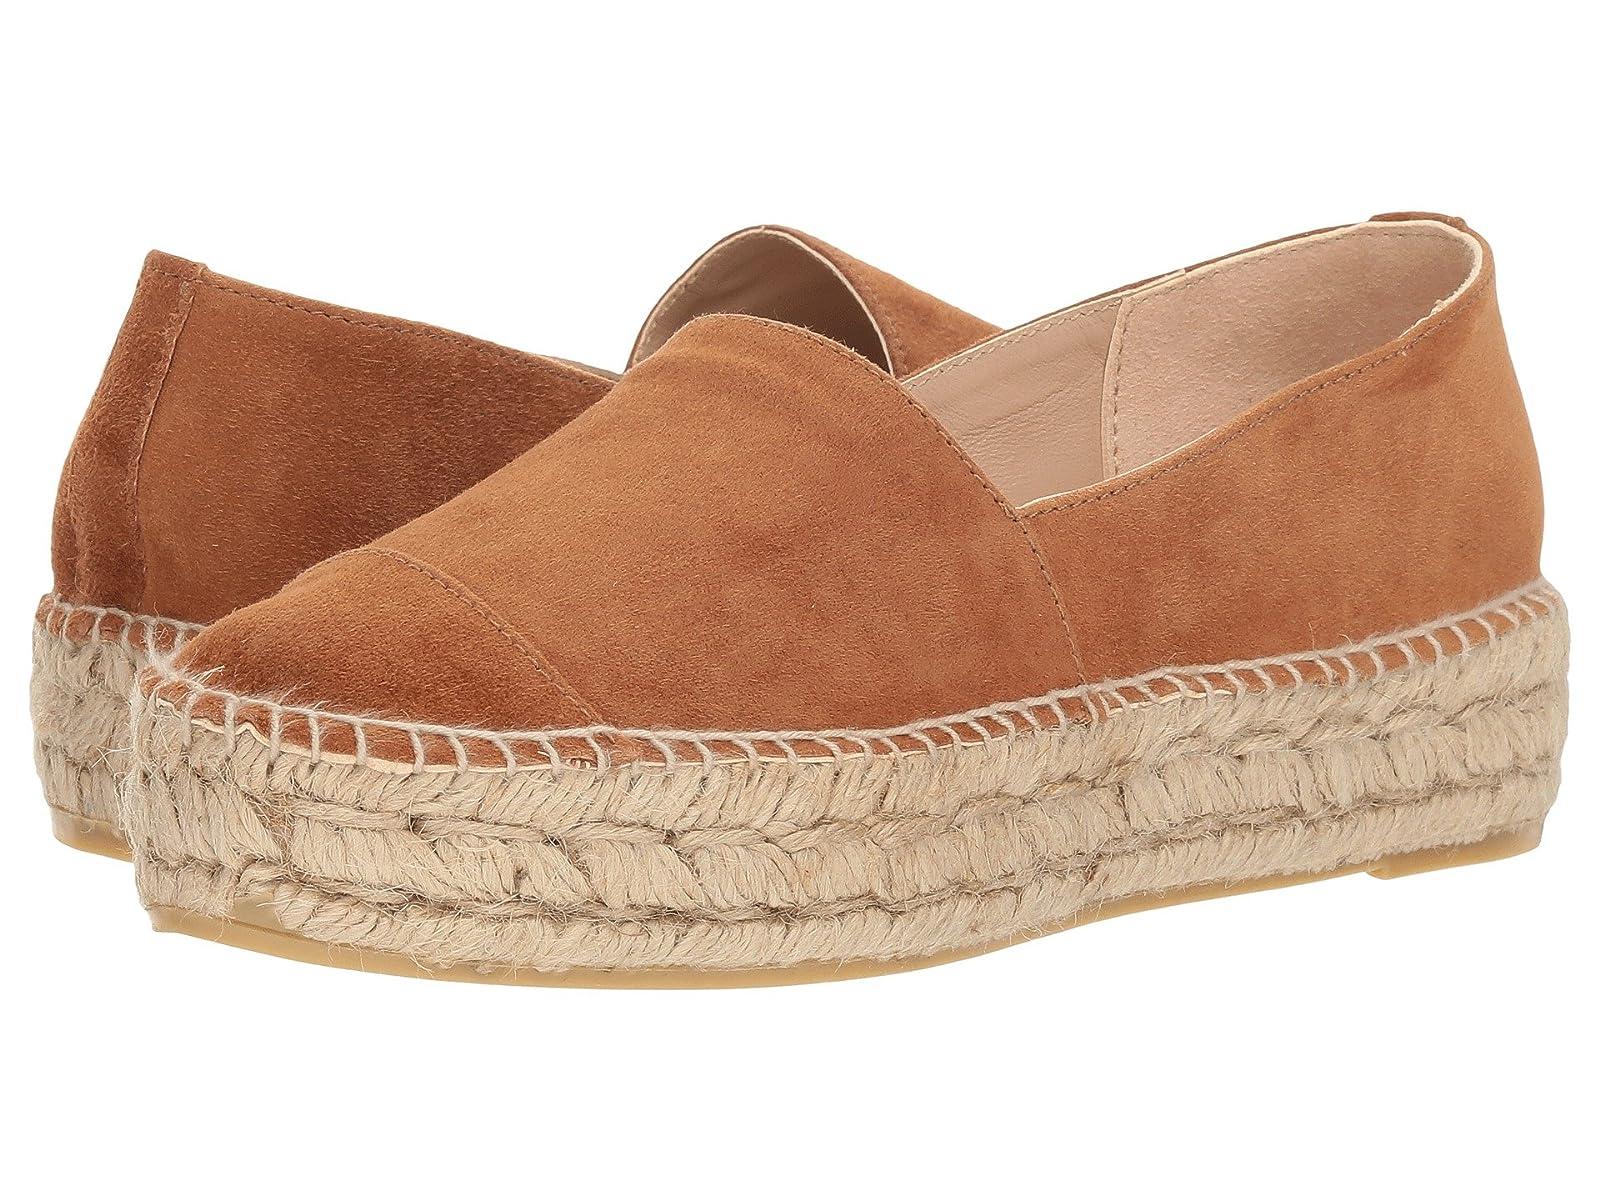 L.K. Bennett TaliaAtmospheric grades have affordable shoes